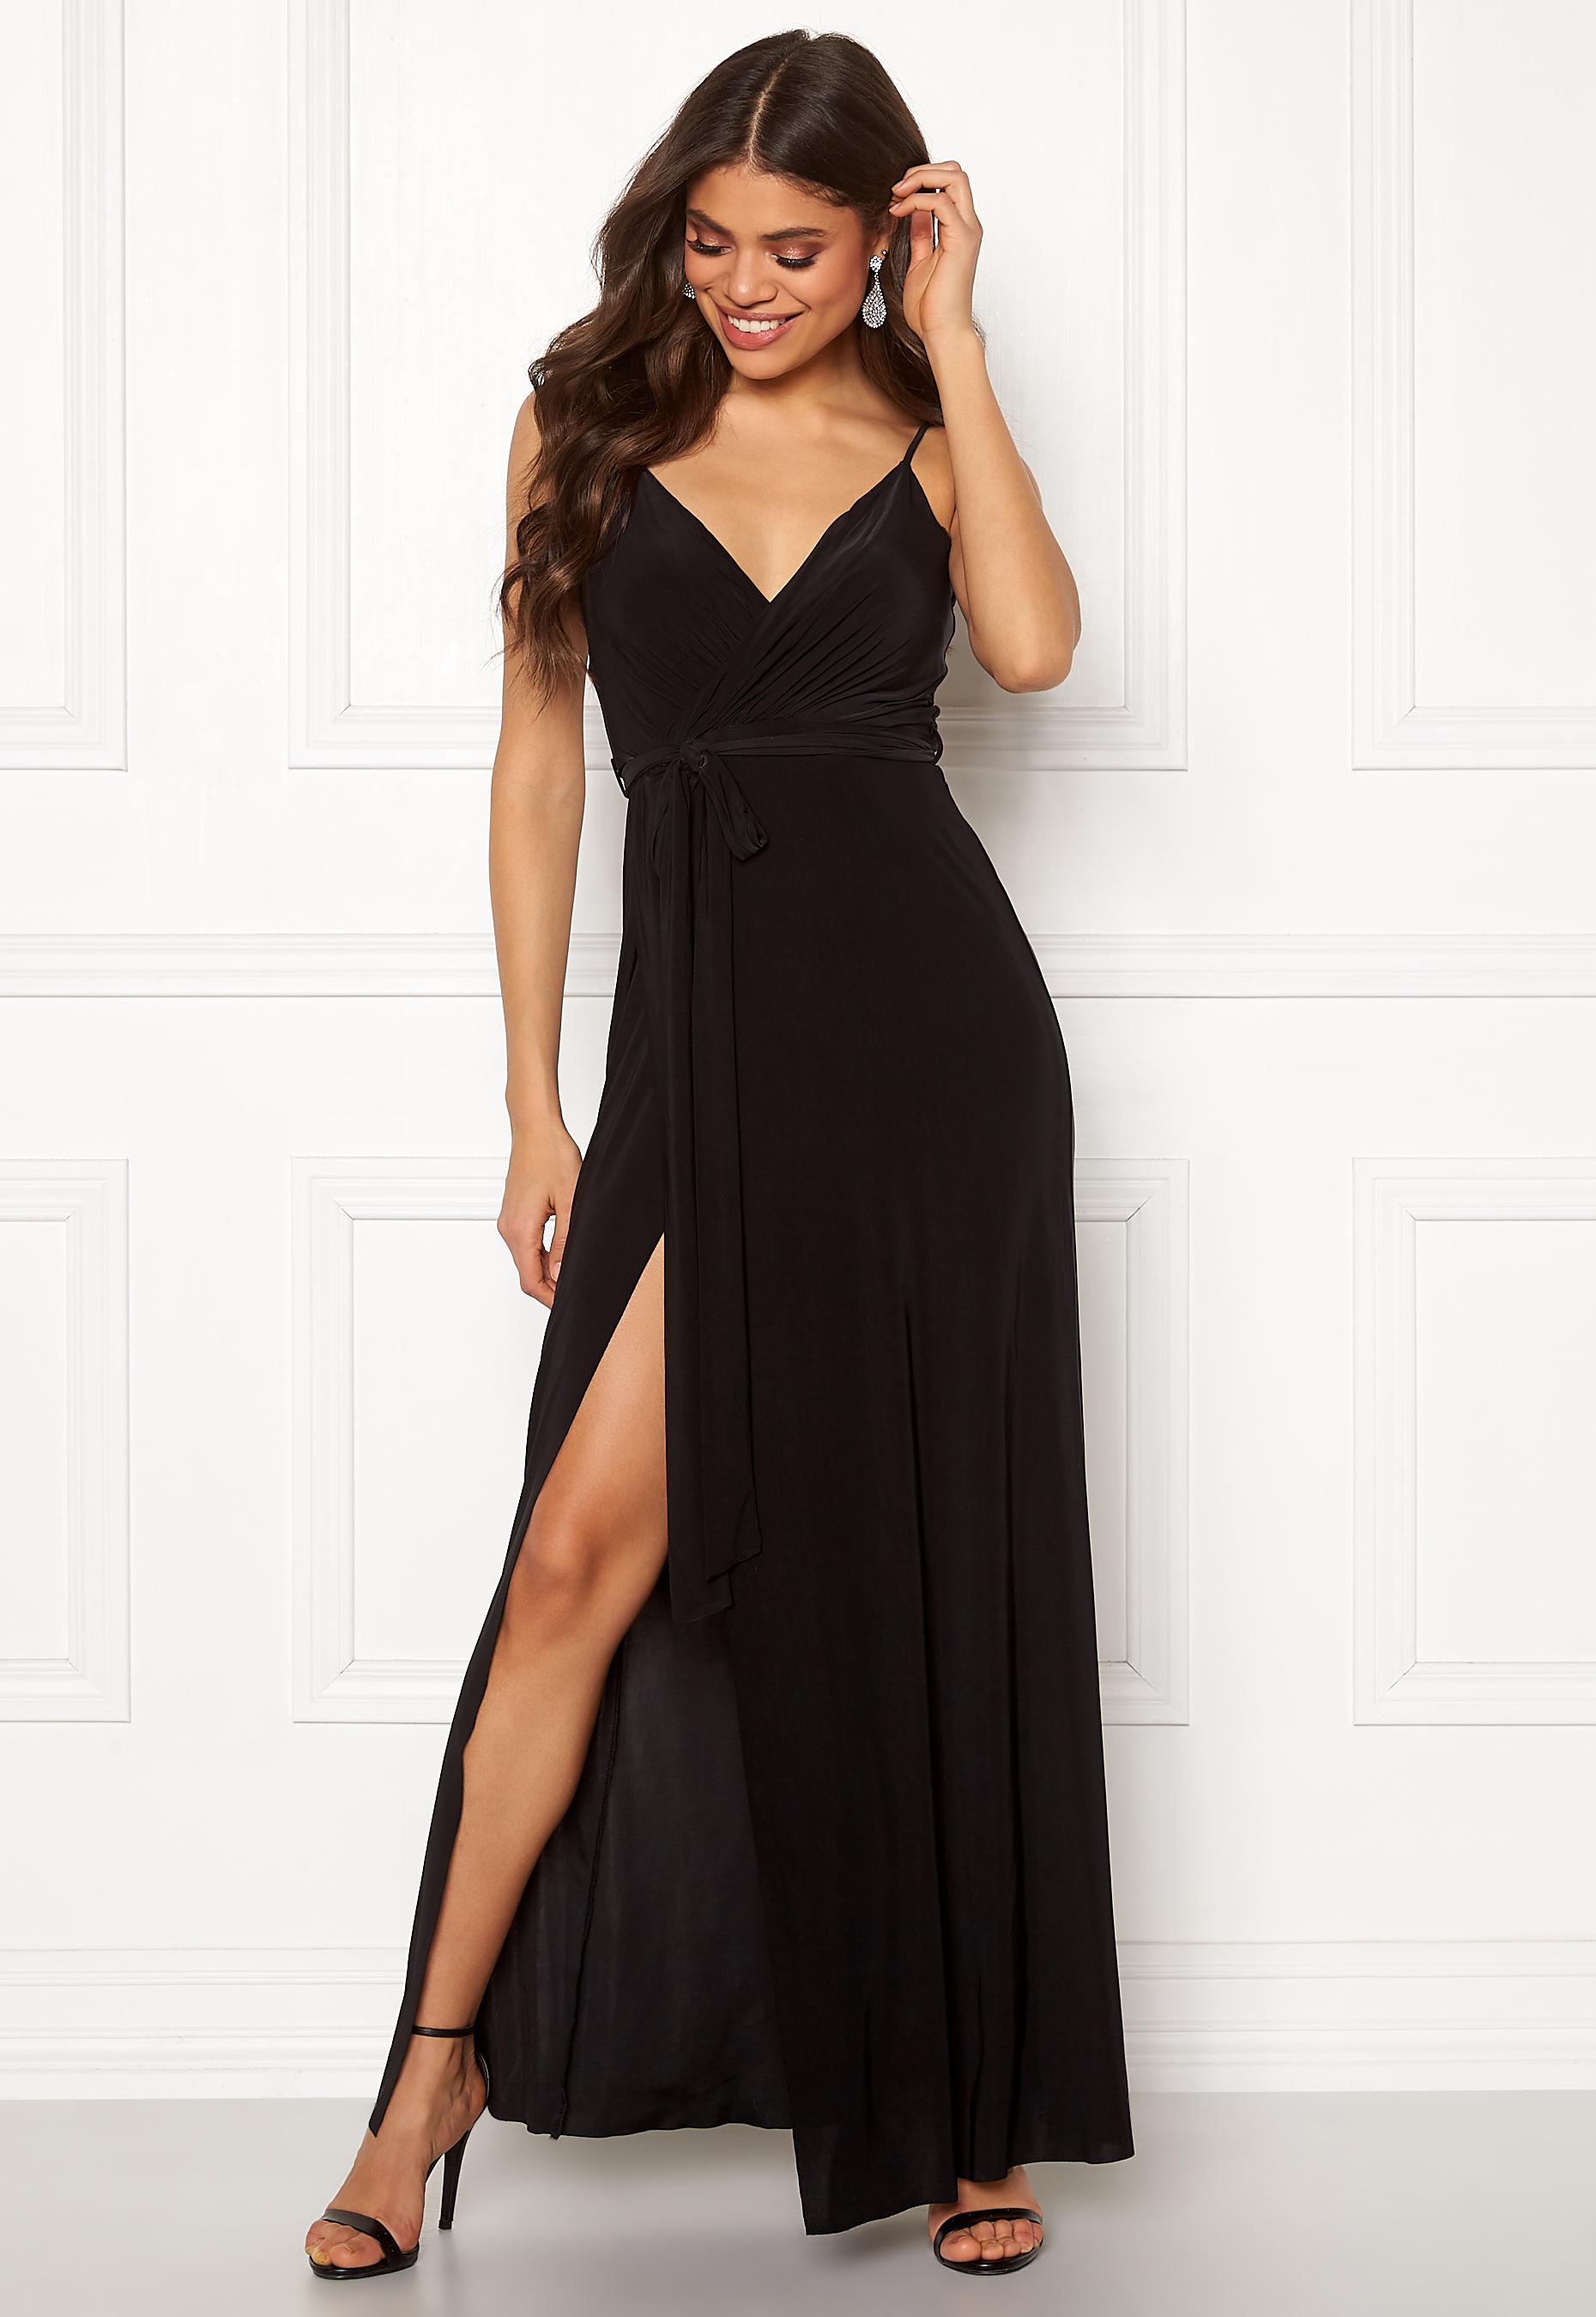 bd08b0b69282 Goddiva Wrap Front Maxi Dress Black - Bubbleroom